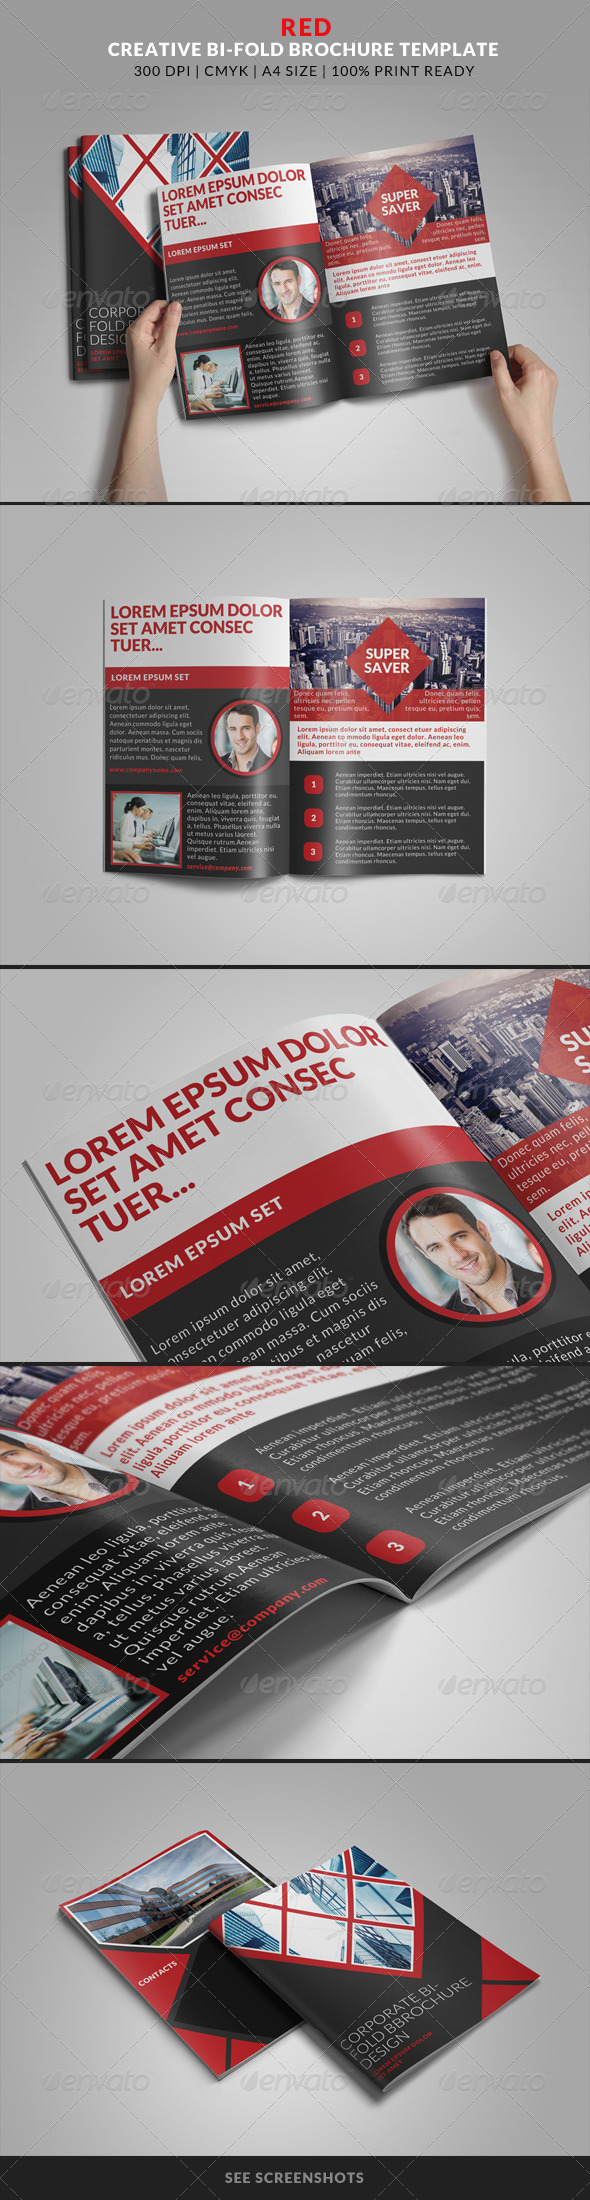 GraphicRiver Red Creative Bi-Fold Brochure Template 8203269